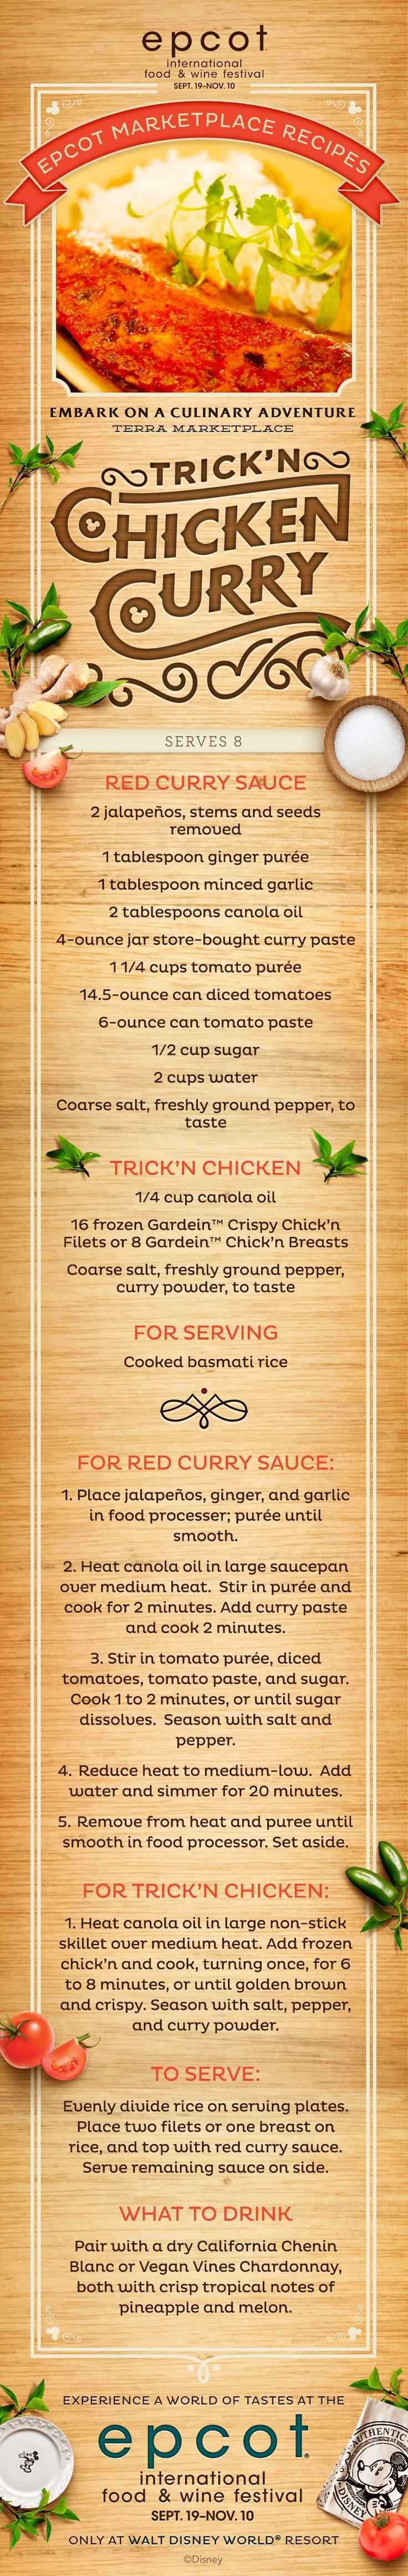 Chicken Curry Recipe from Epcot International Food & Wine Festival at Walt Disney World